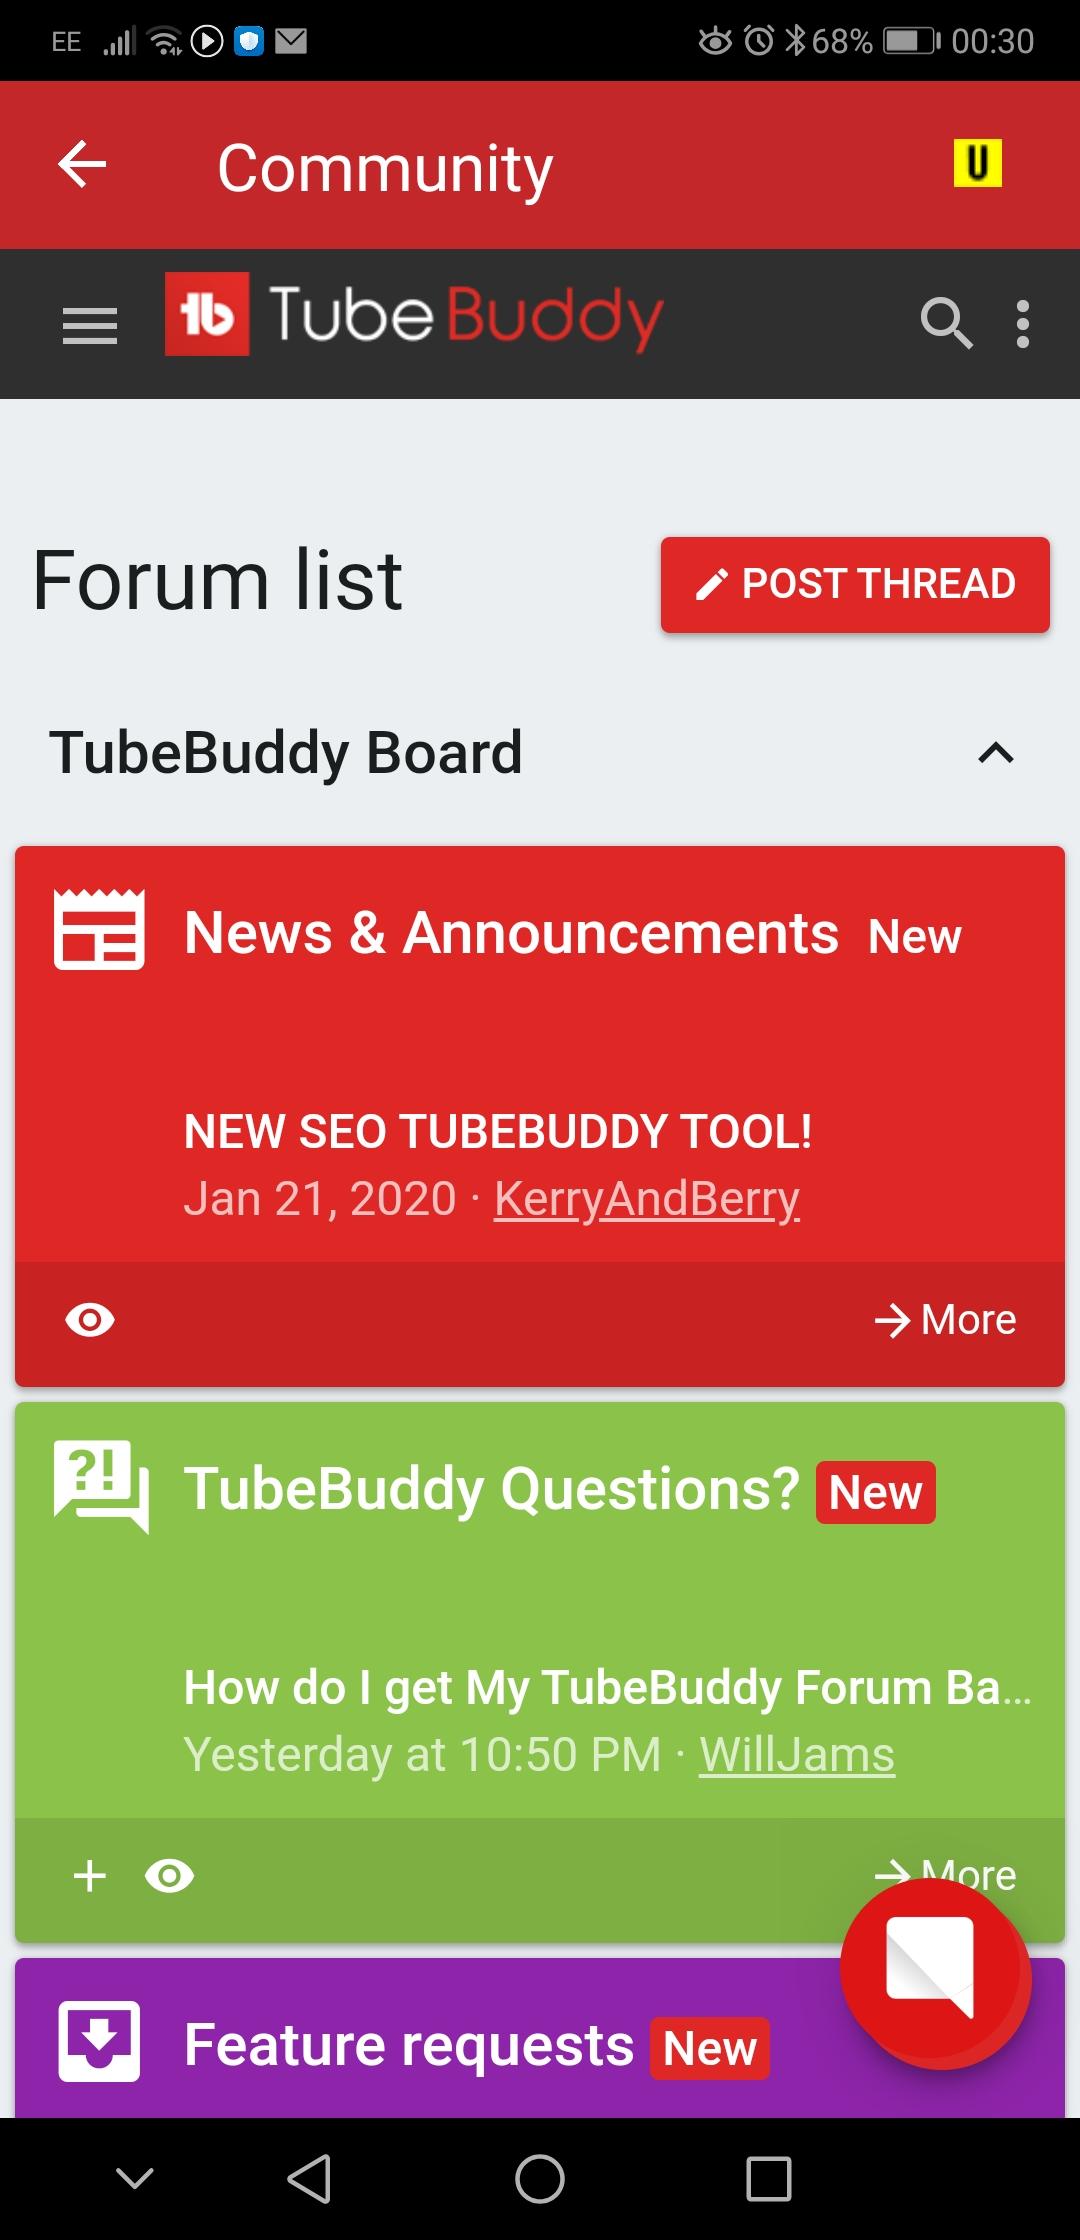 Screenshot_20200205_003035_com.tubebuddy.tubebuddy_mobile.jpg